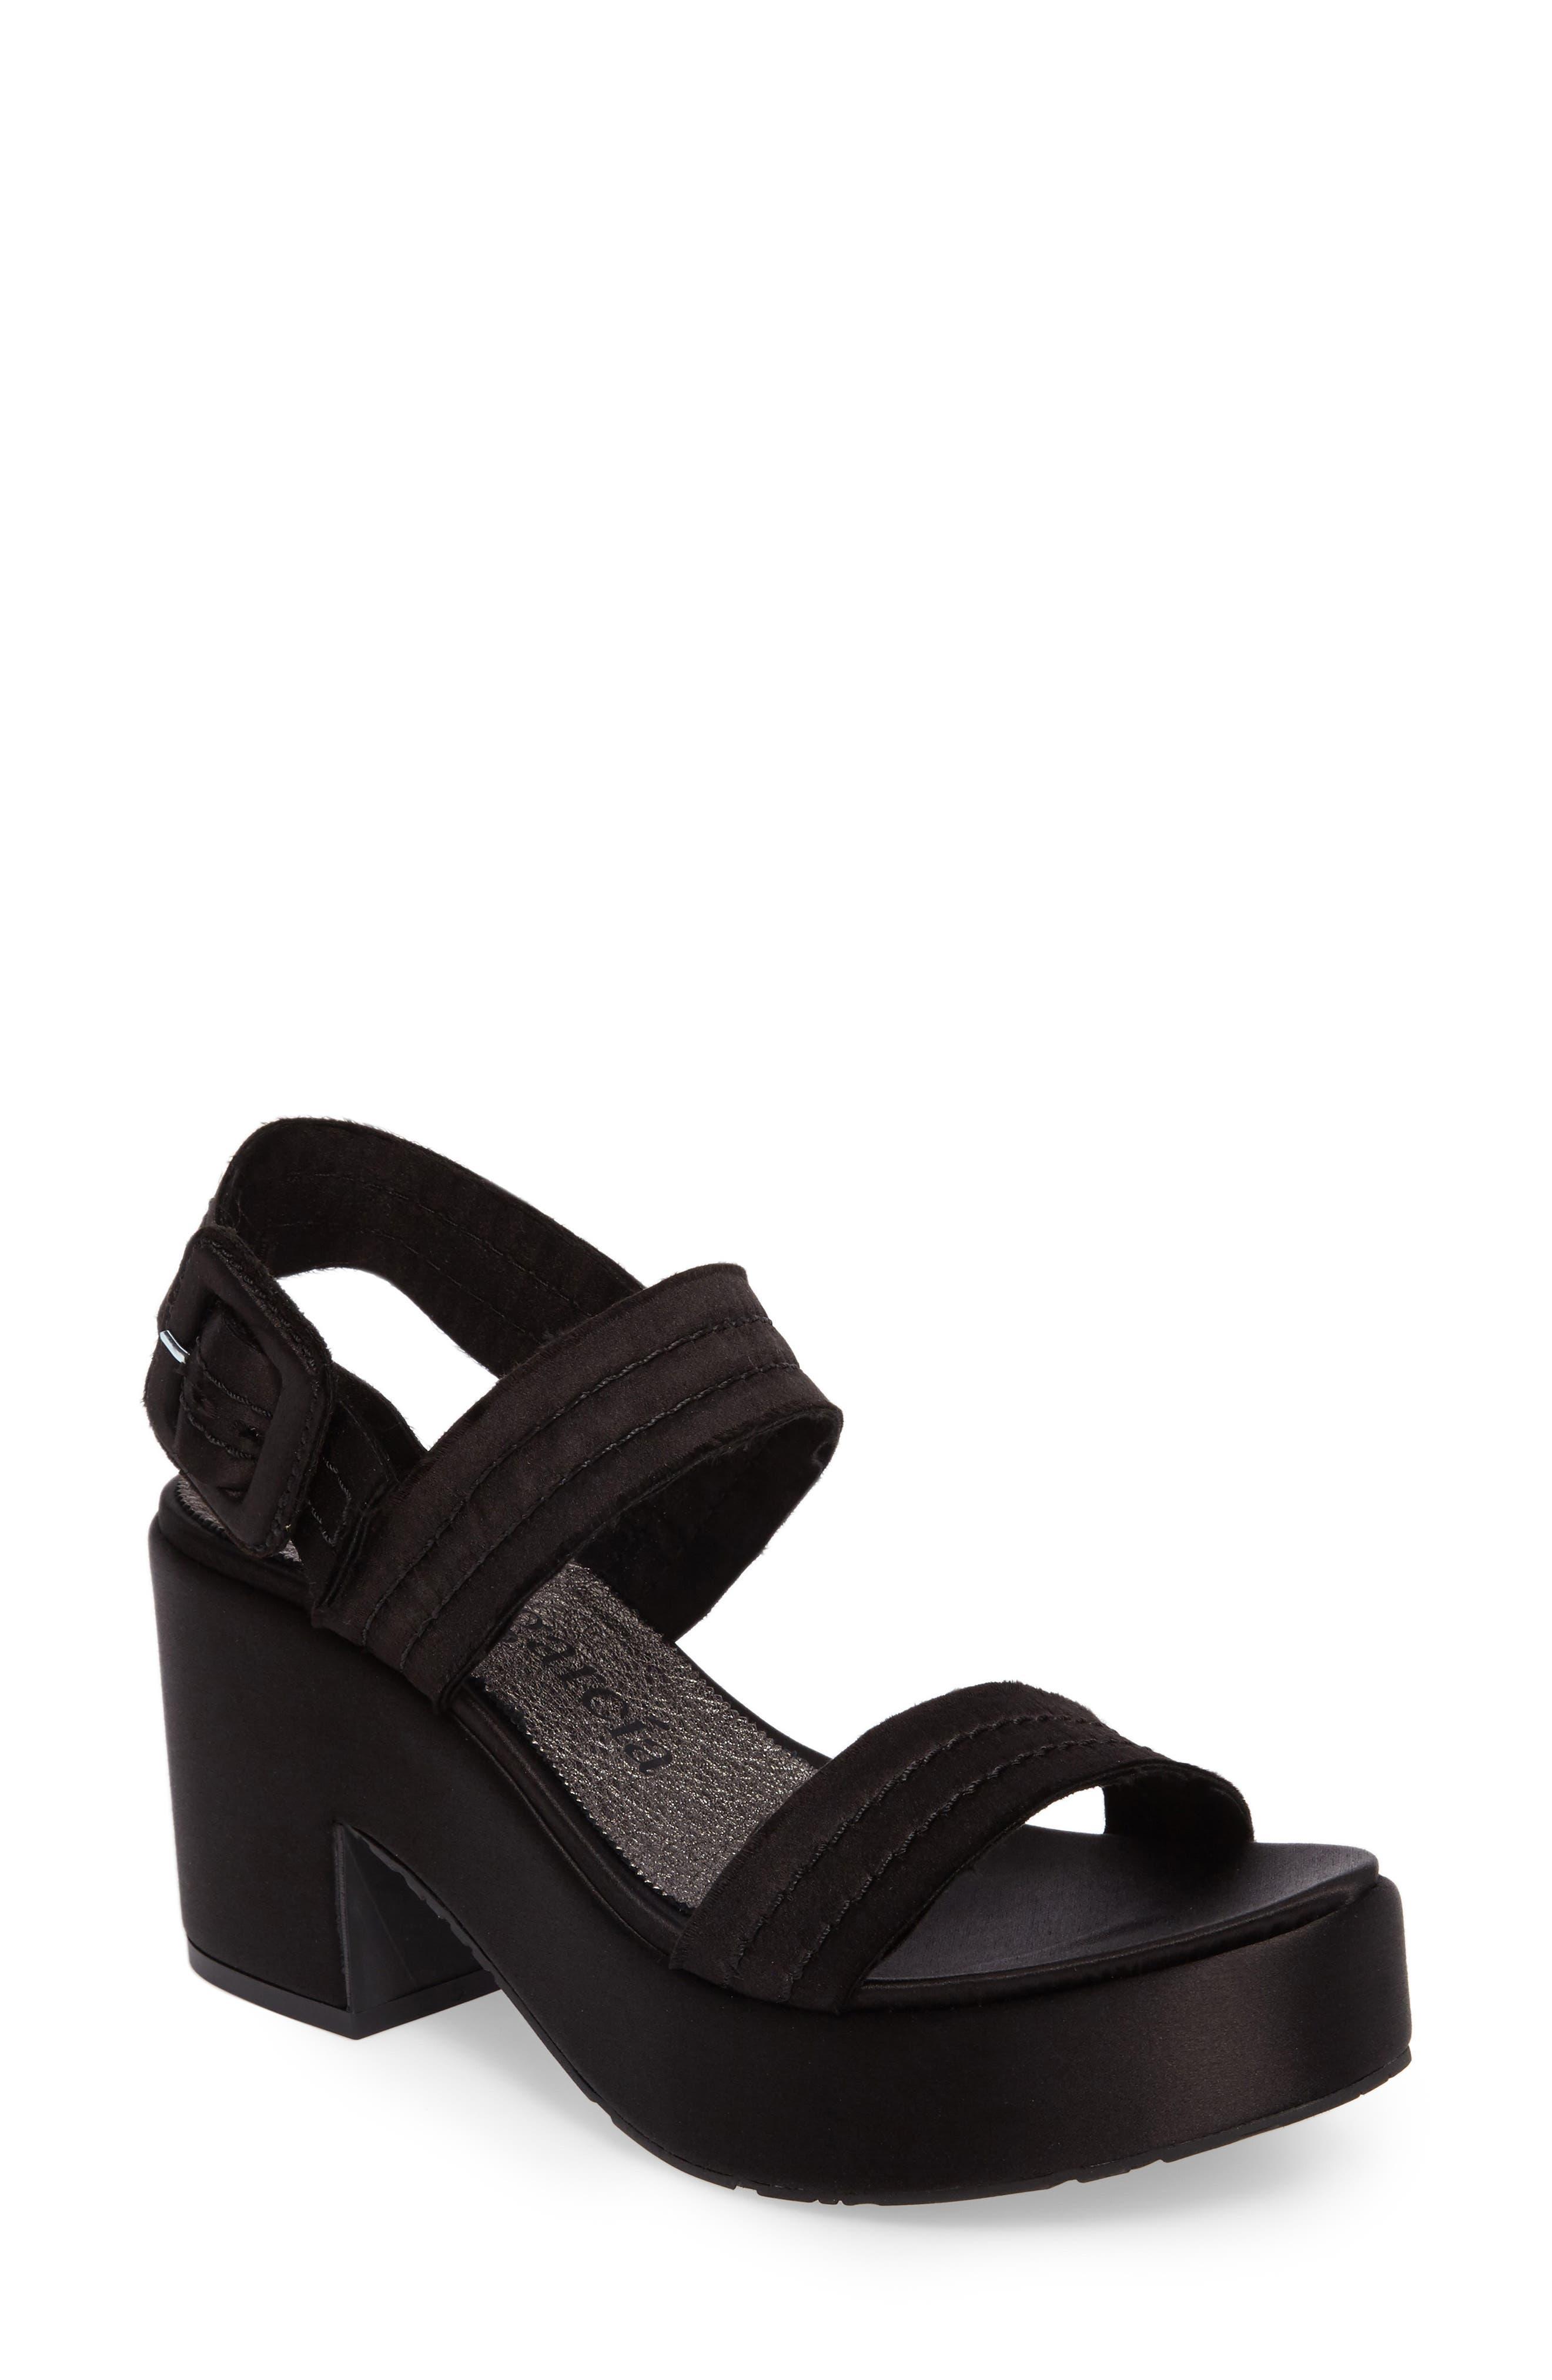 Alternate Image 1 Selected - Pedro Garcia Decima Platform Sandal (Women)